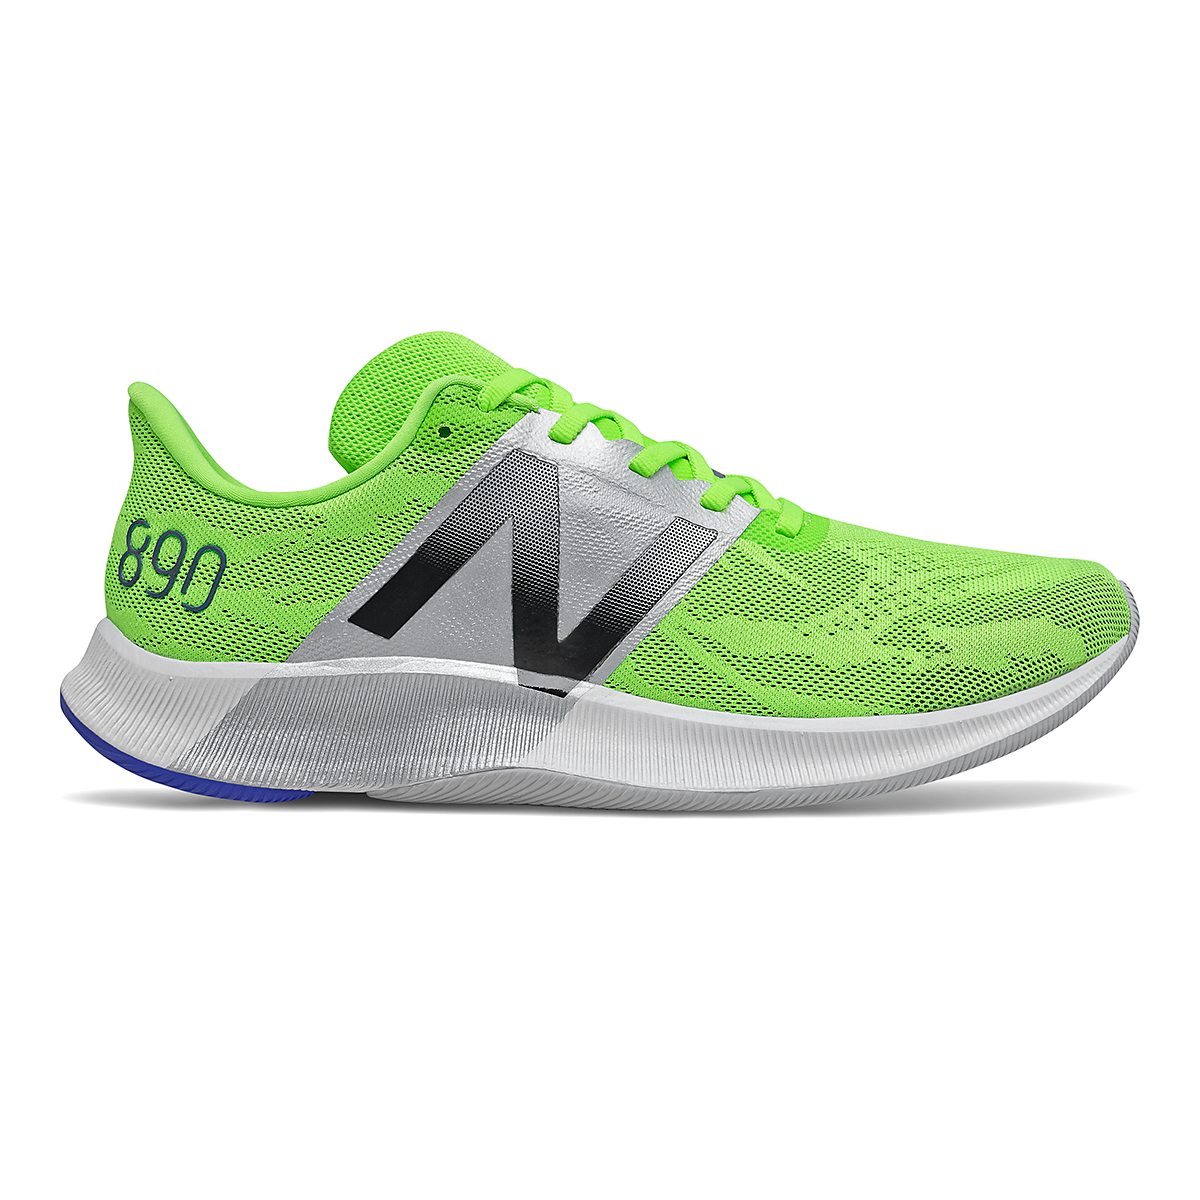 Men's New Balance 890V8 Running Shoe - Color: Energy Lime - Size: 8.5 - Width: Wide, Energy Lime, large, image 1